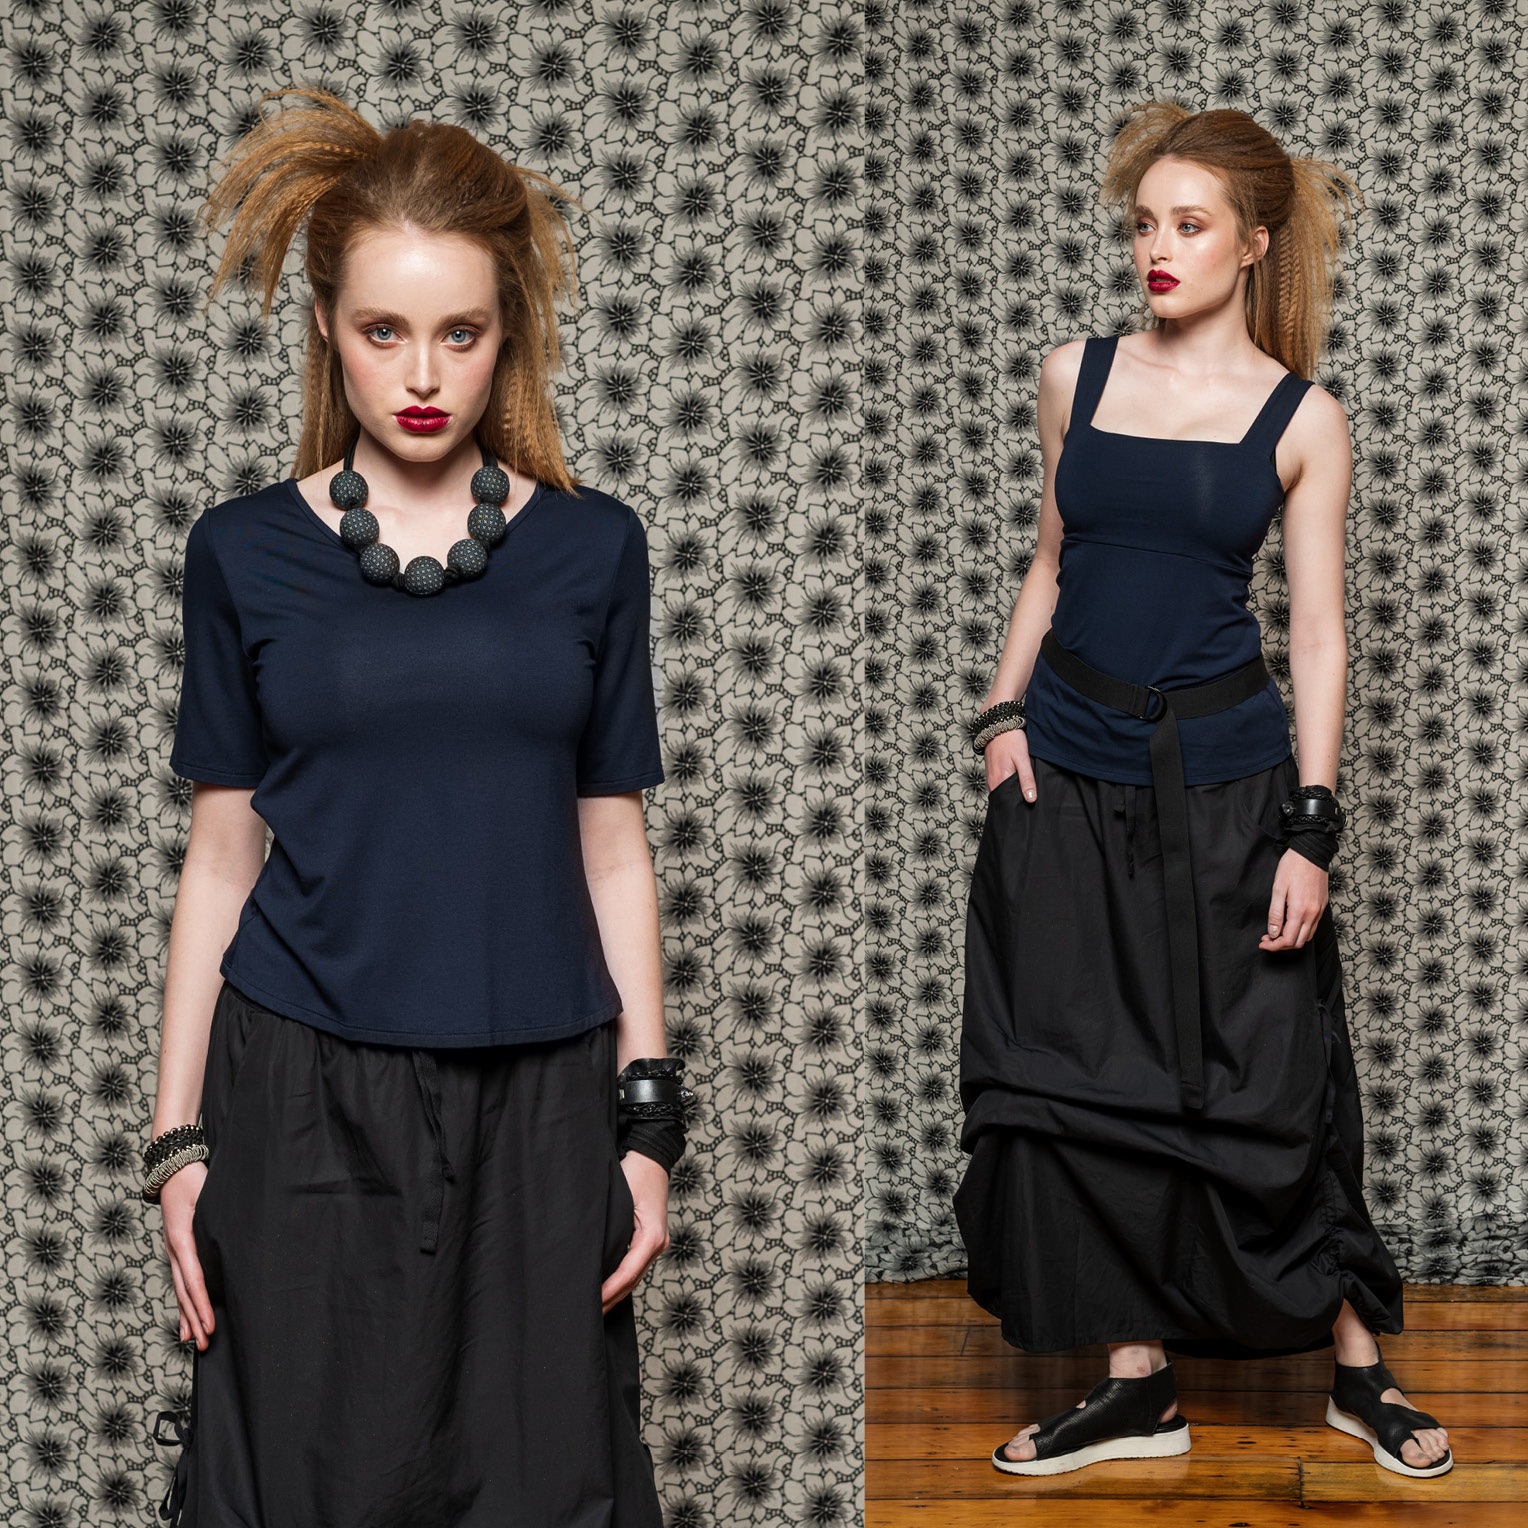 LEFT: Viola Tee & Marmalade Skirt  RIGHT: Eternal Top & Marmalade Skirt